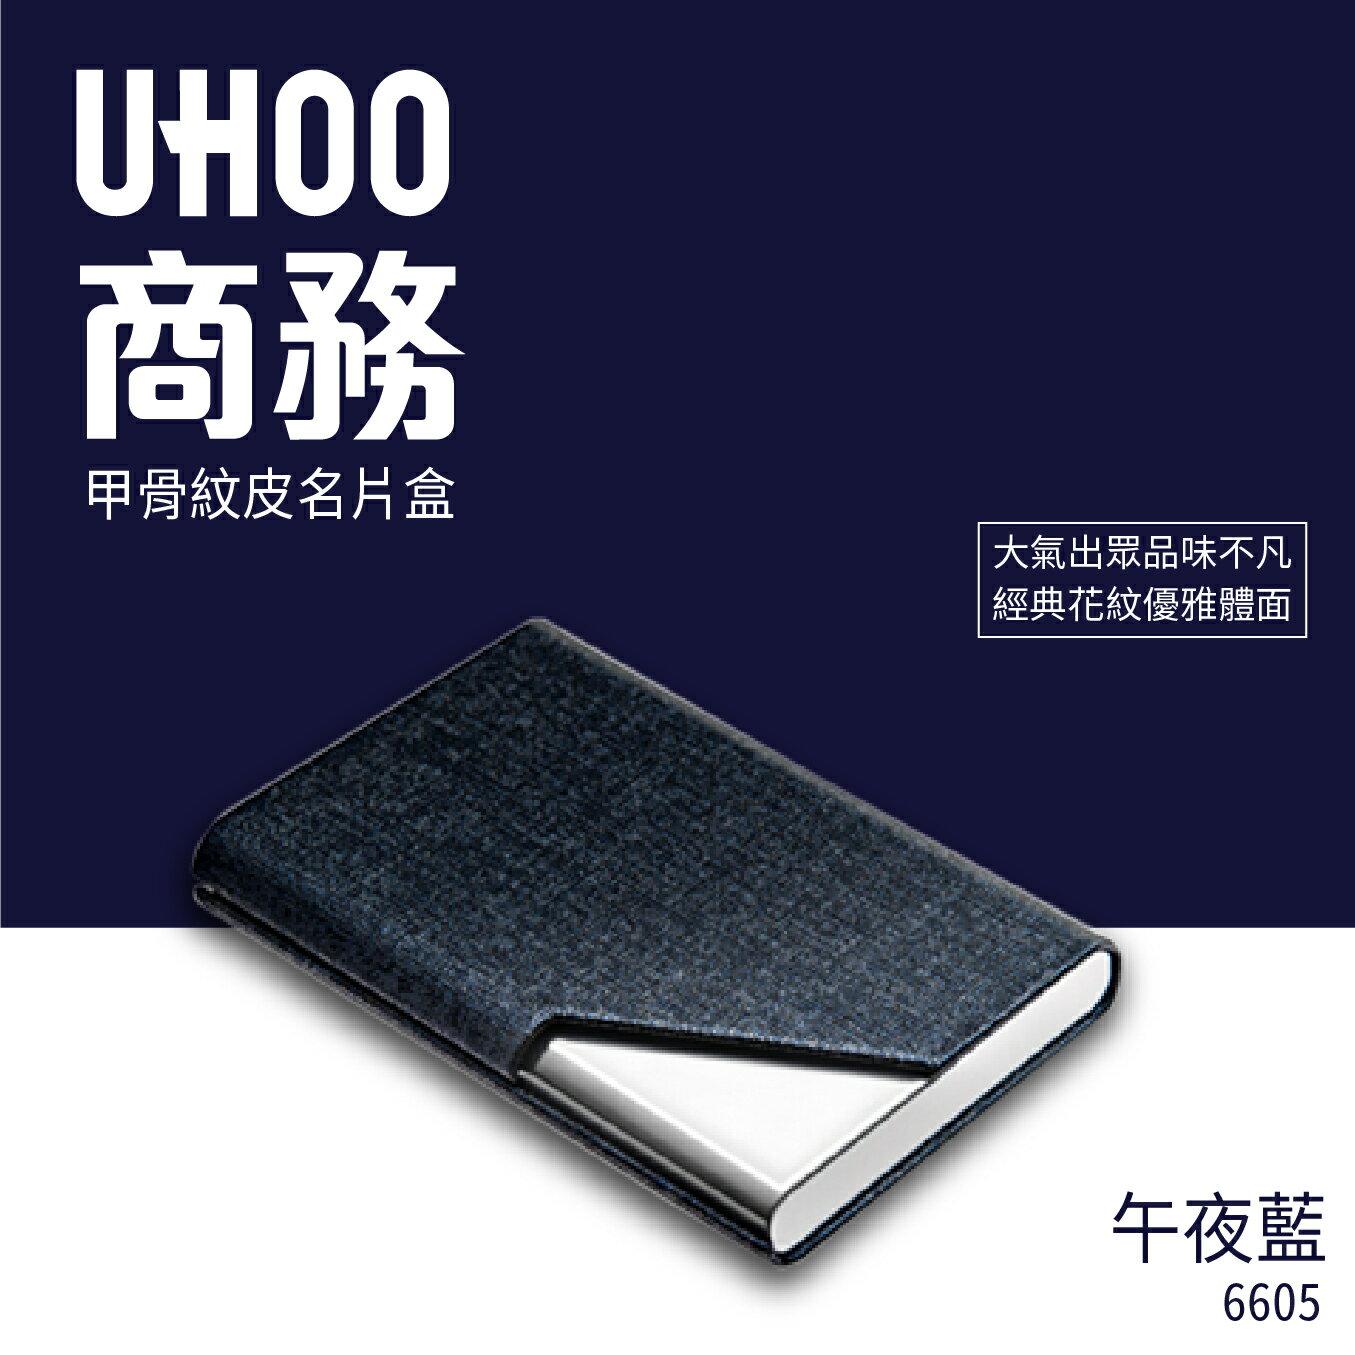 UHOO 6605 商務名片盒(藍)名片夾 業務 盒子 名片收納 自我介紹 商務交流 合作名片 卡夾 車票夾 證件夾